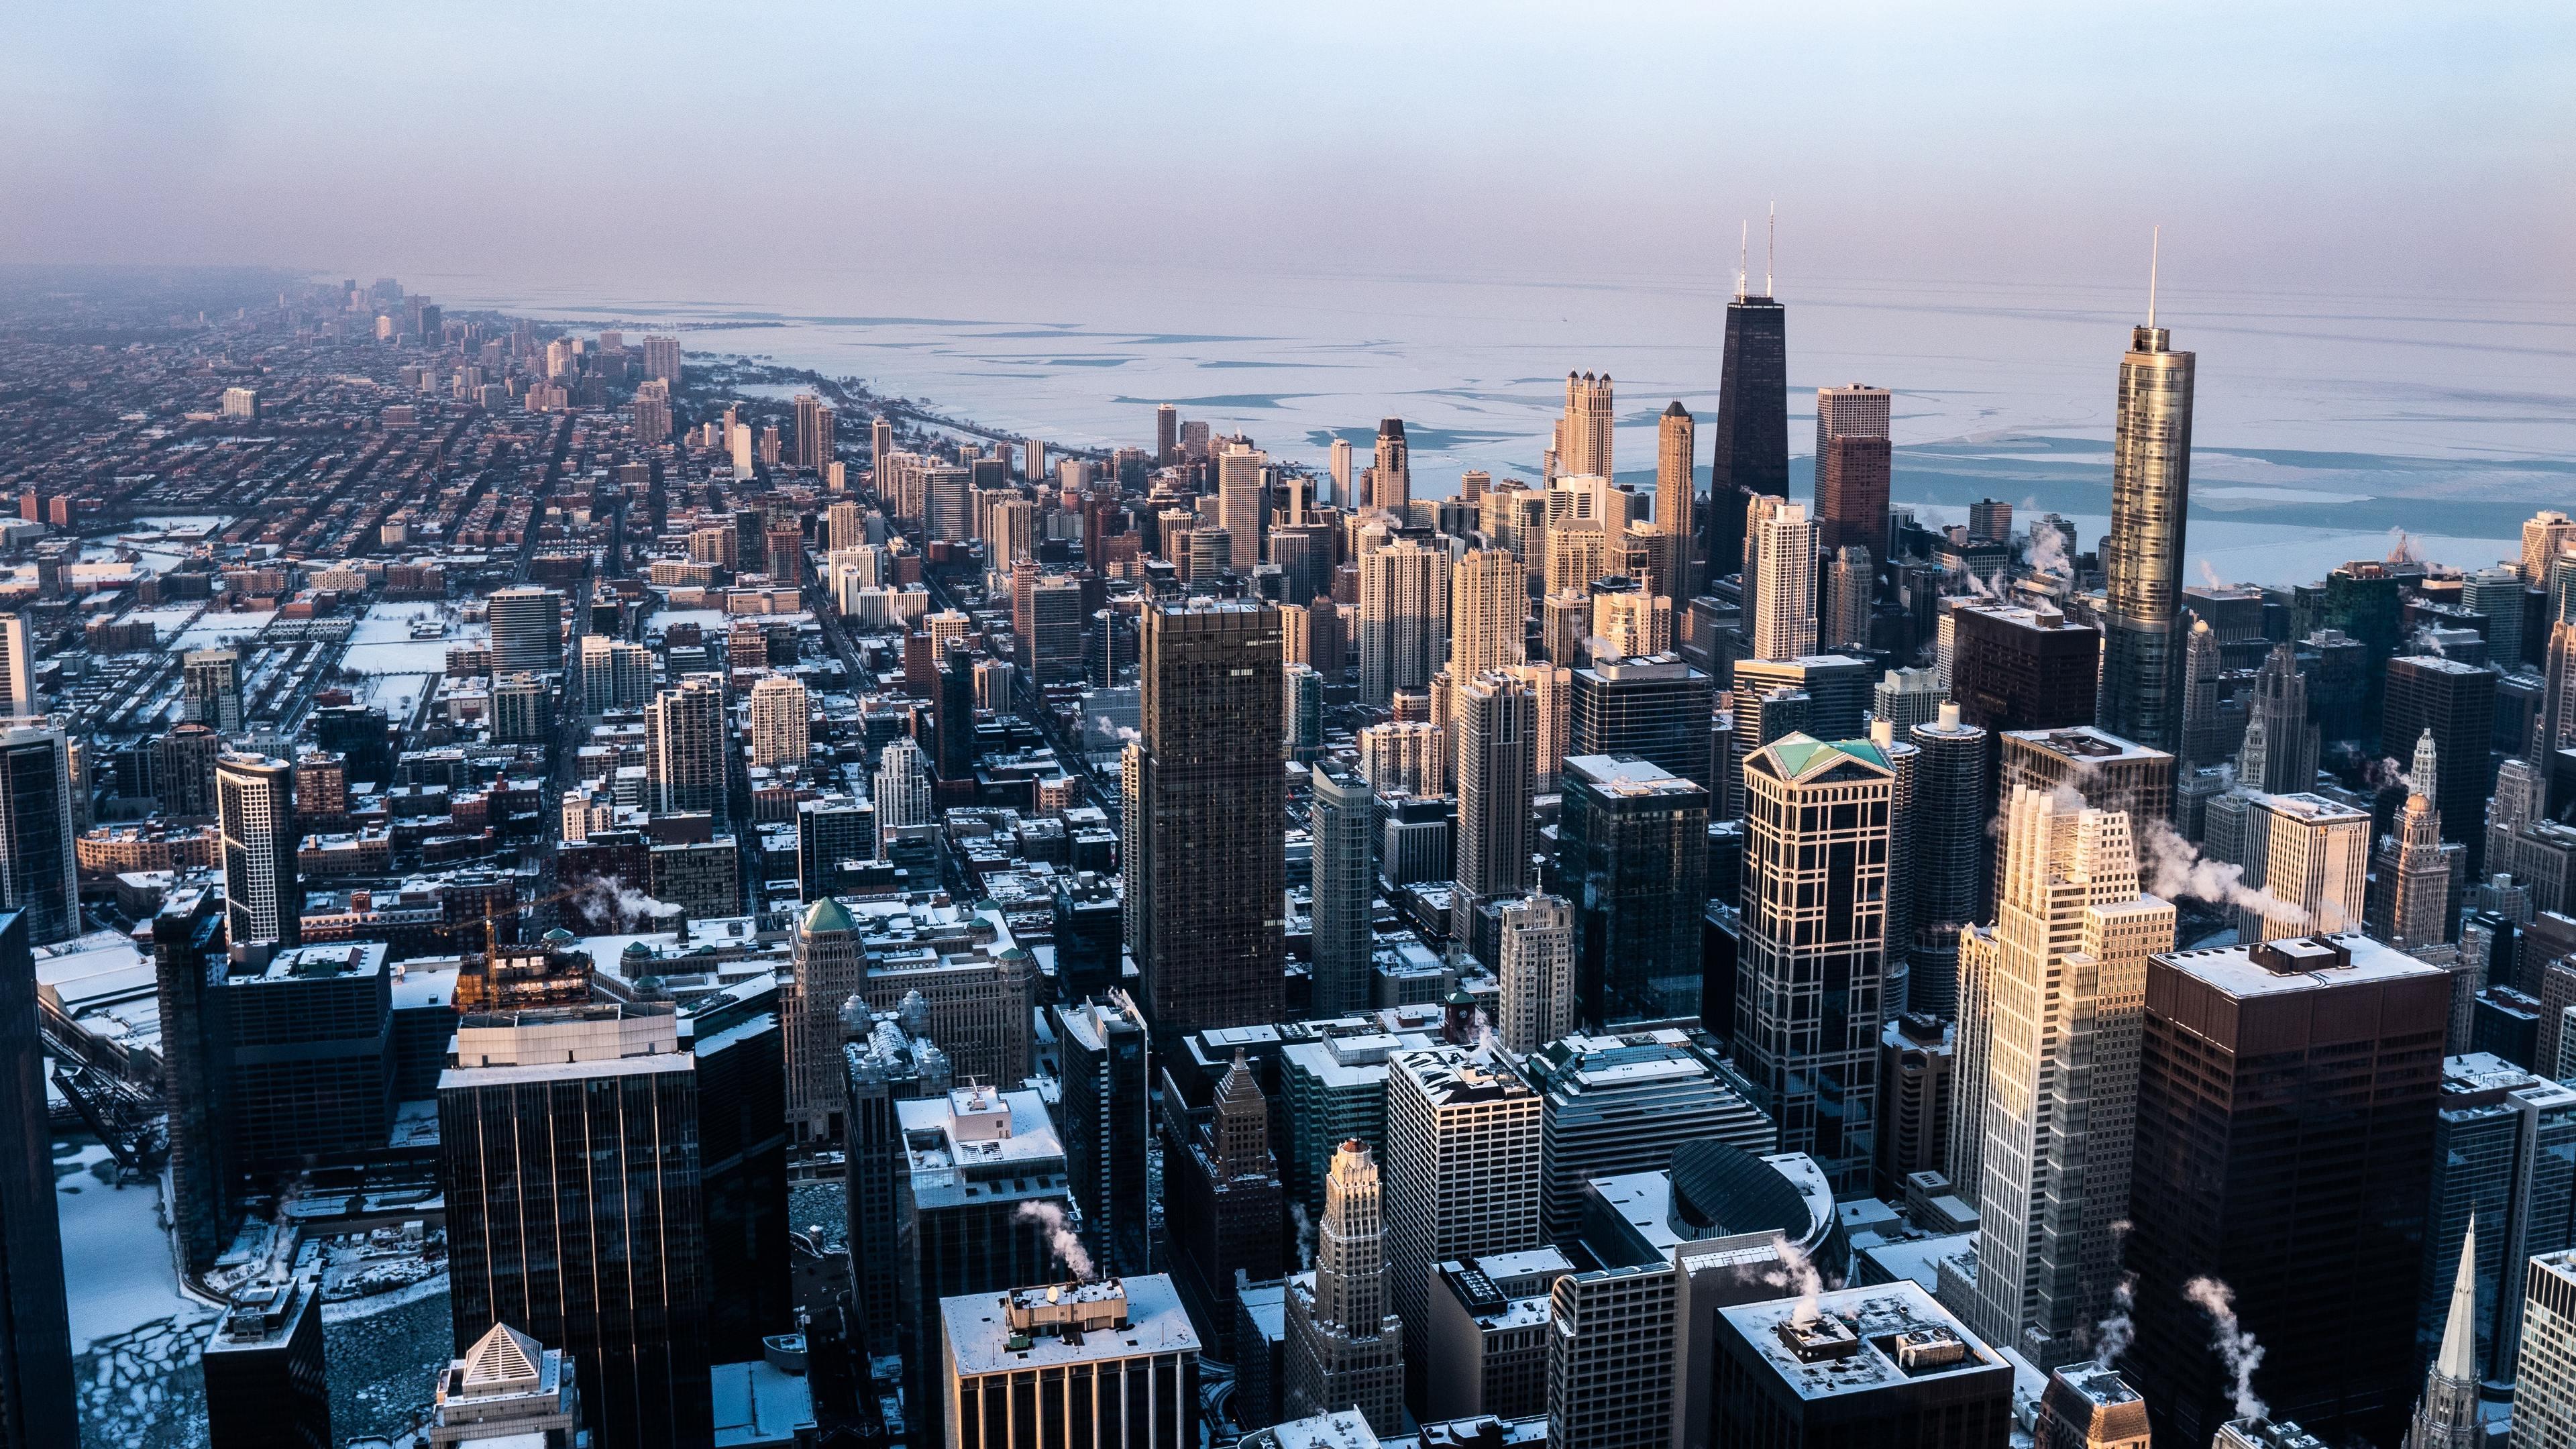 chicago united states 4k 1560535872 - Chicago United States 4k - world wallpapers, usa wallpapers, hd-wallpapers, cityscape wallpapers, chicago wallpapers, buildings wallpapers, 4k-wallpapers